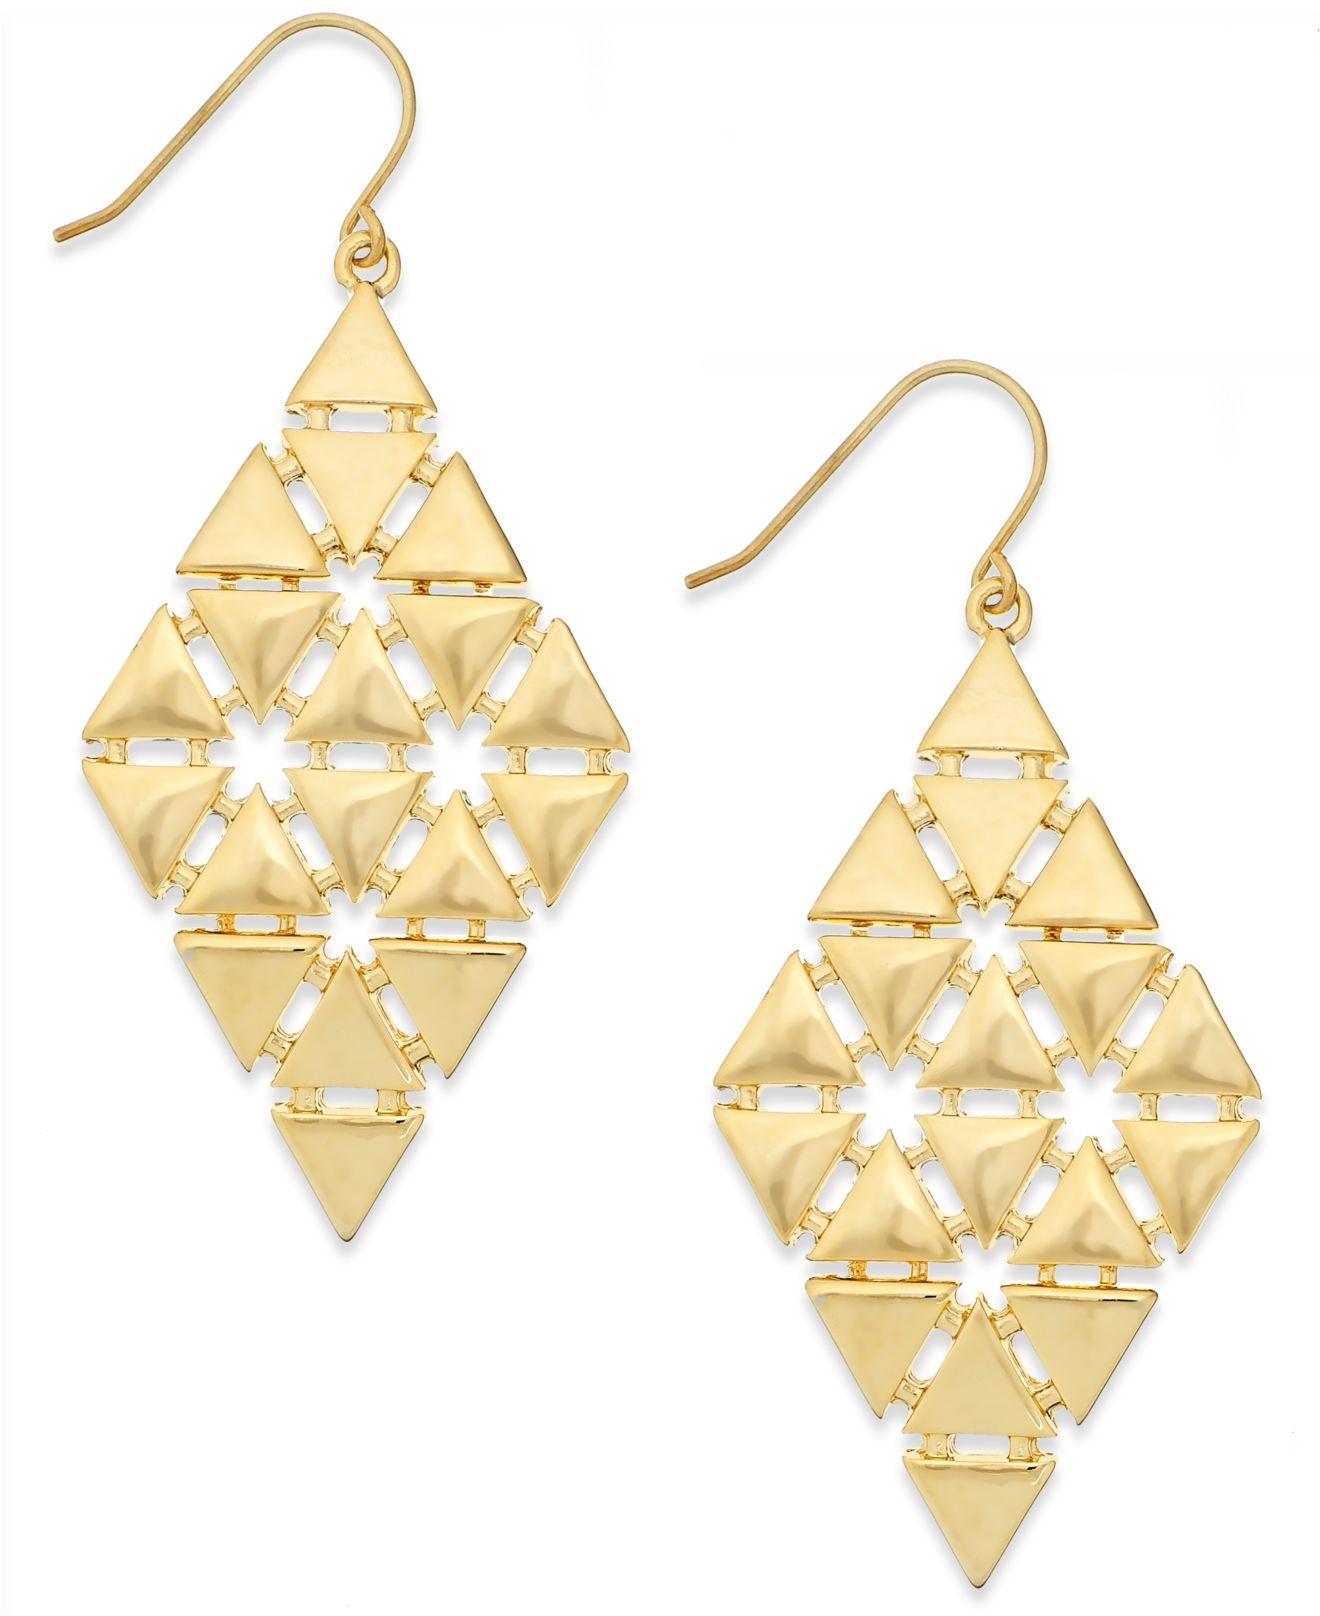 Lyst lauren by ralph lauren gold tone triangle chandelier earrings gallery aloadofball Image collections